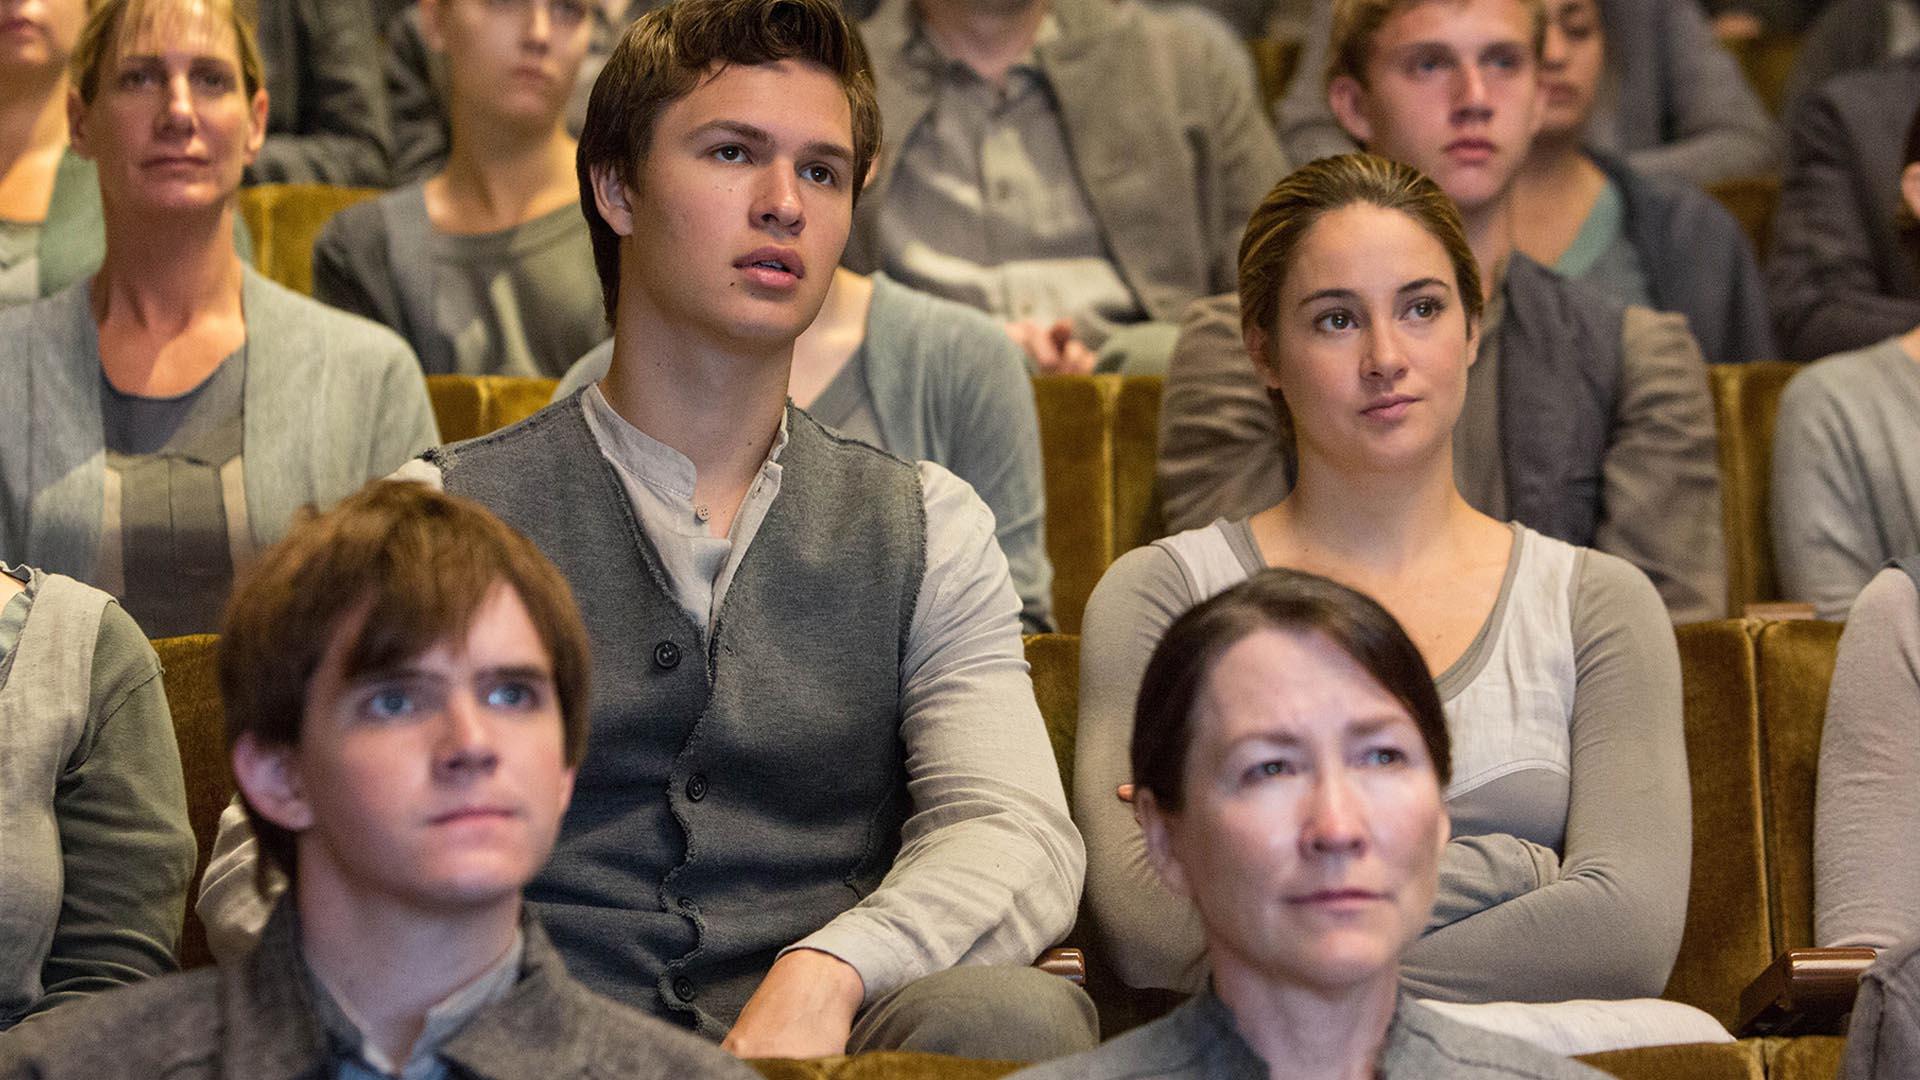 Divergent 2014 Shailene Woodley Kate Winslet Lionsgate